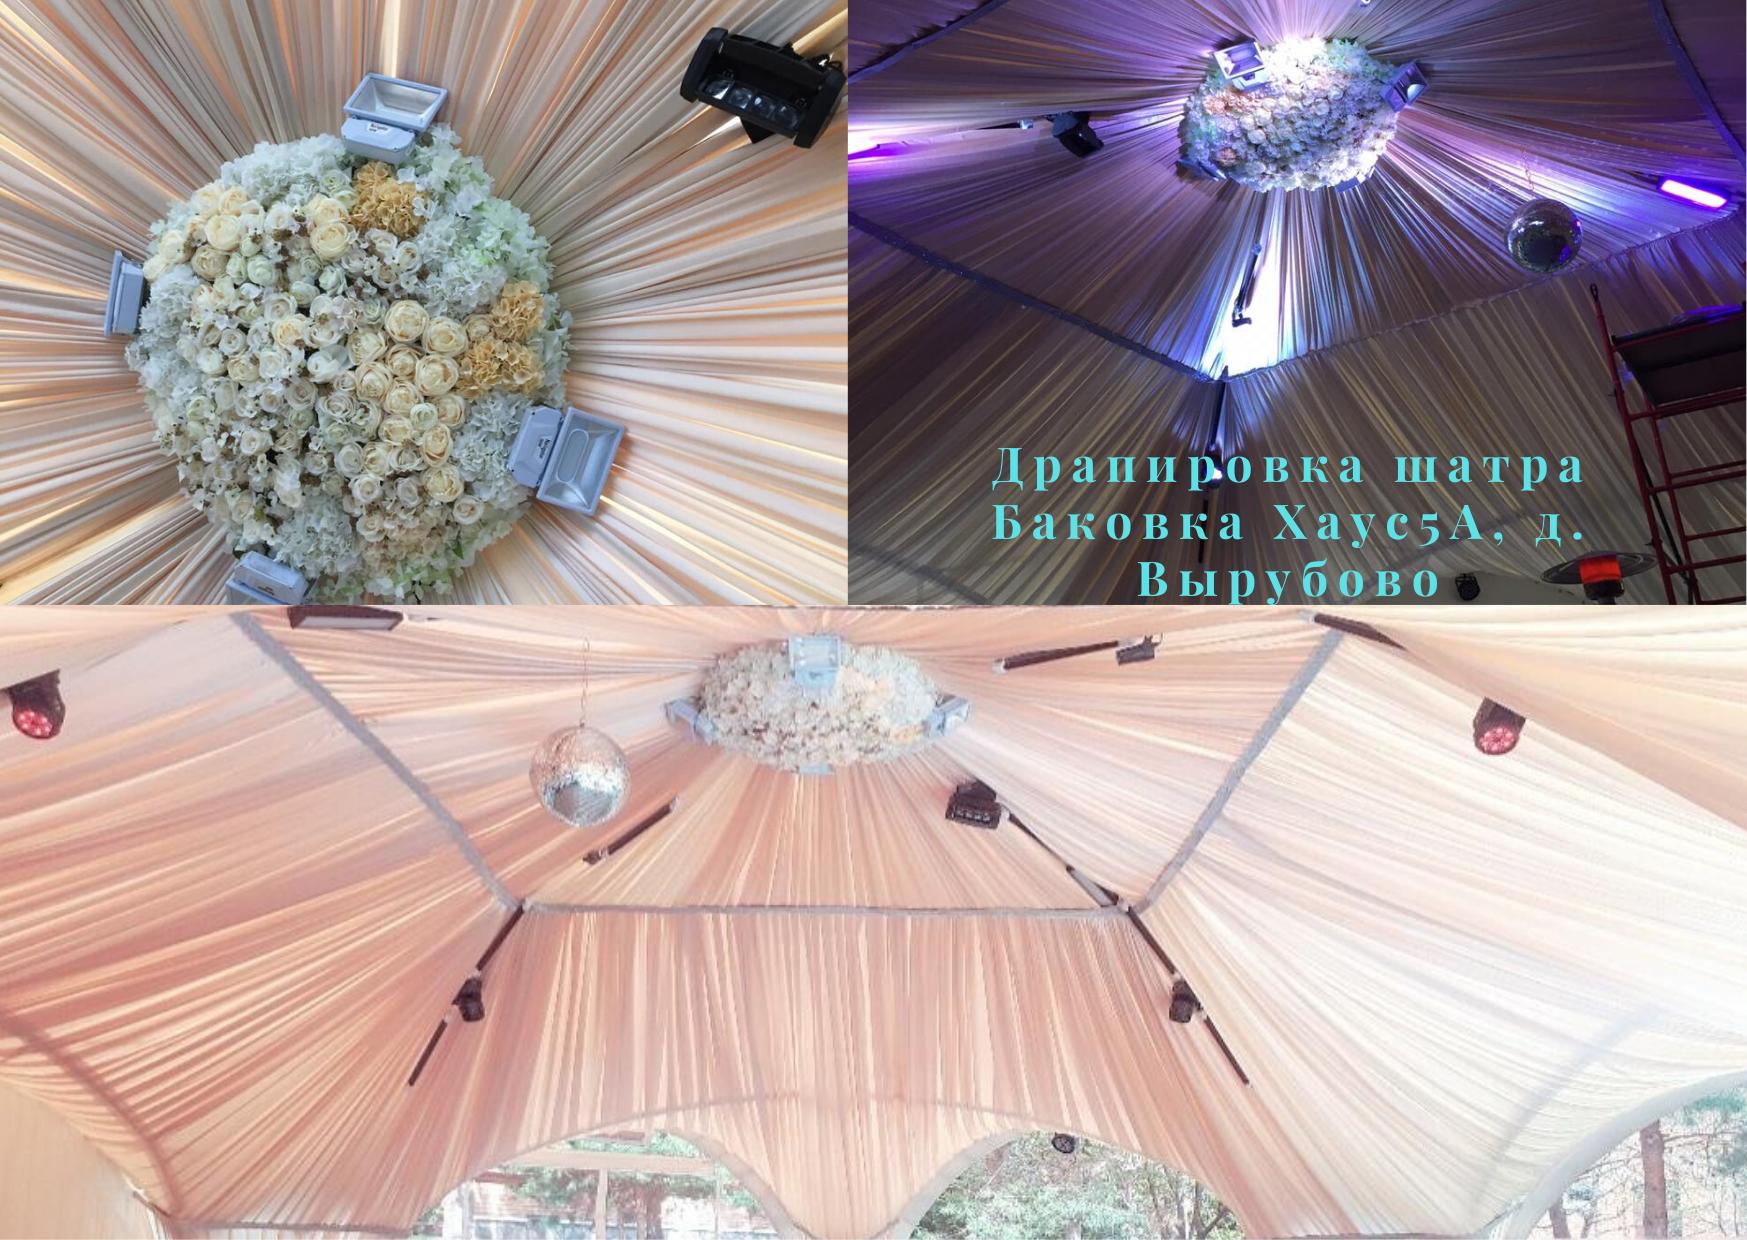 Проект FirstTent драпировка шатра в Баковка Хаус